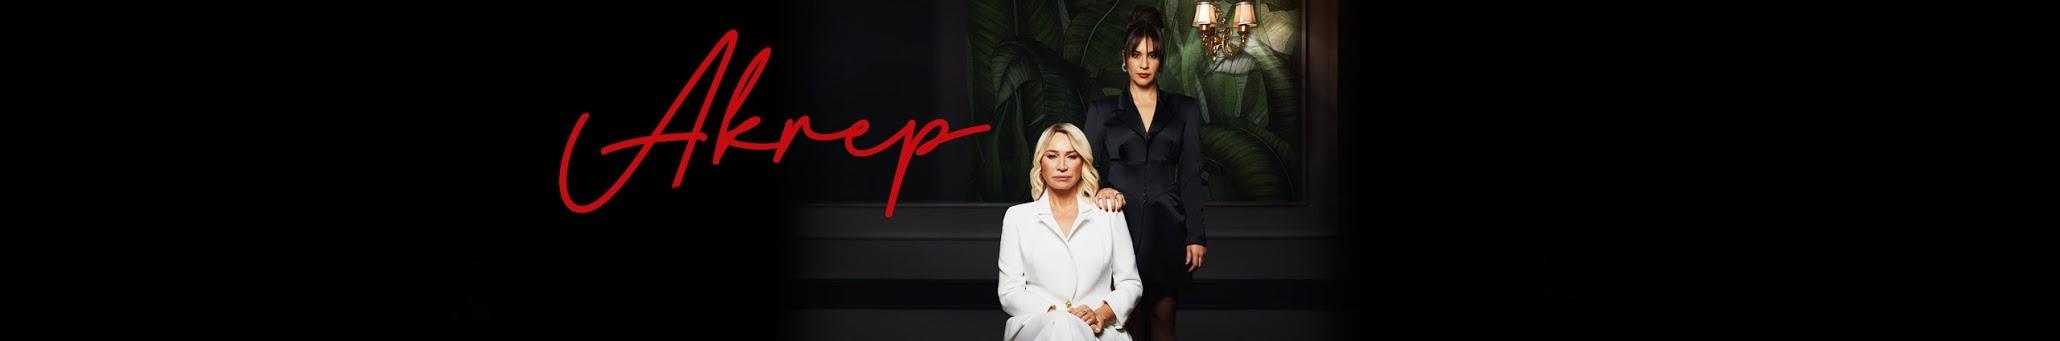 Akrep Season 1 English subtitles | Scorpion